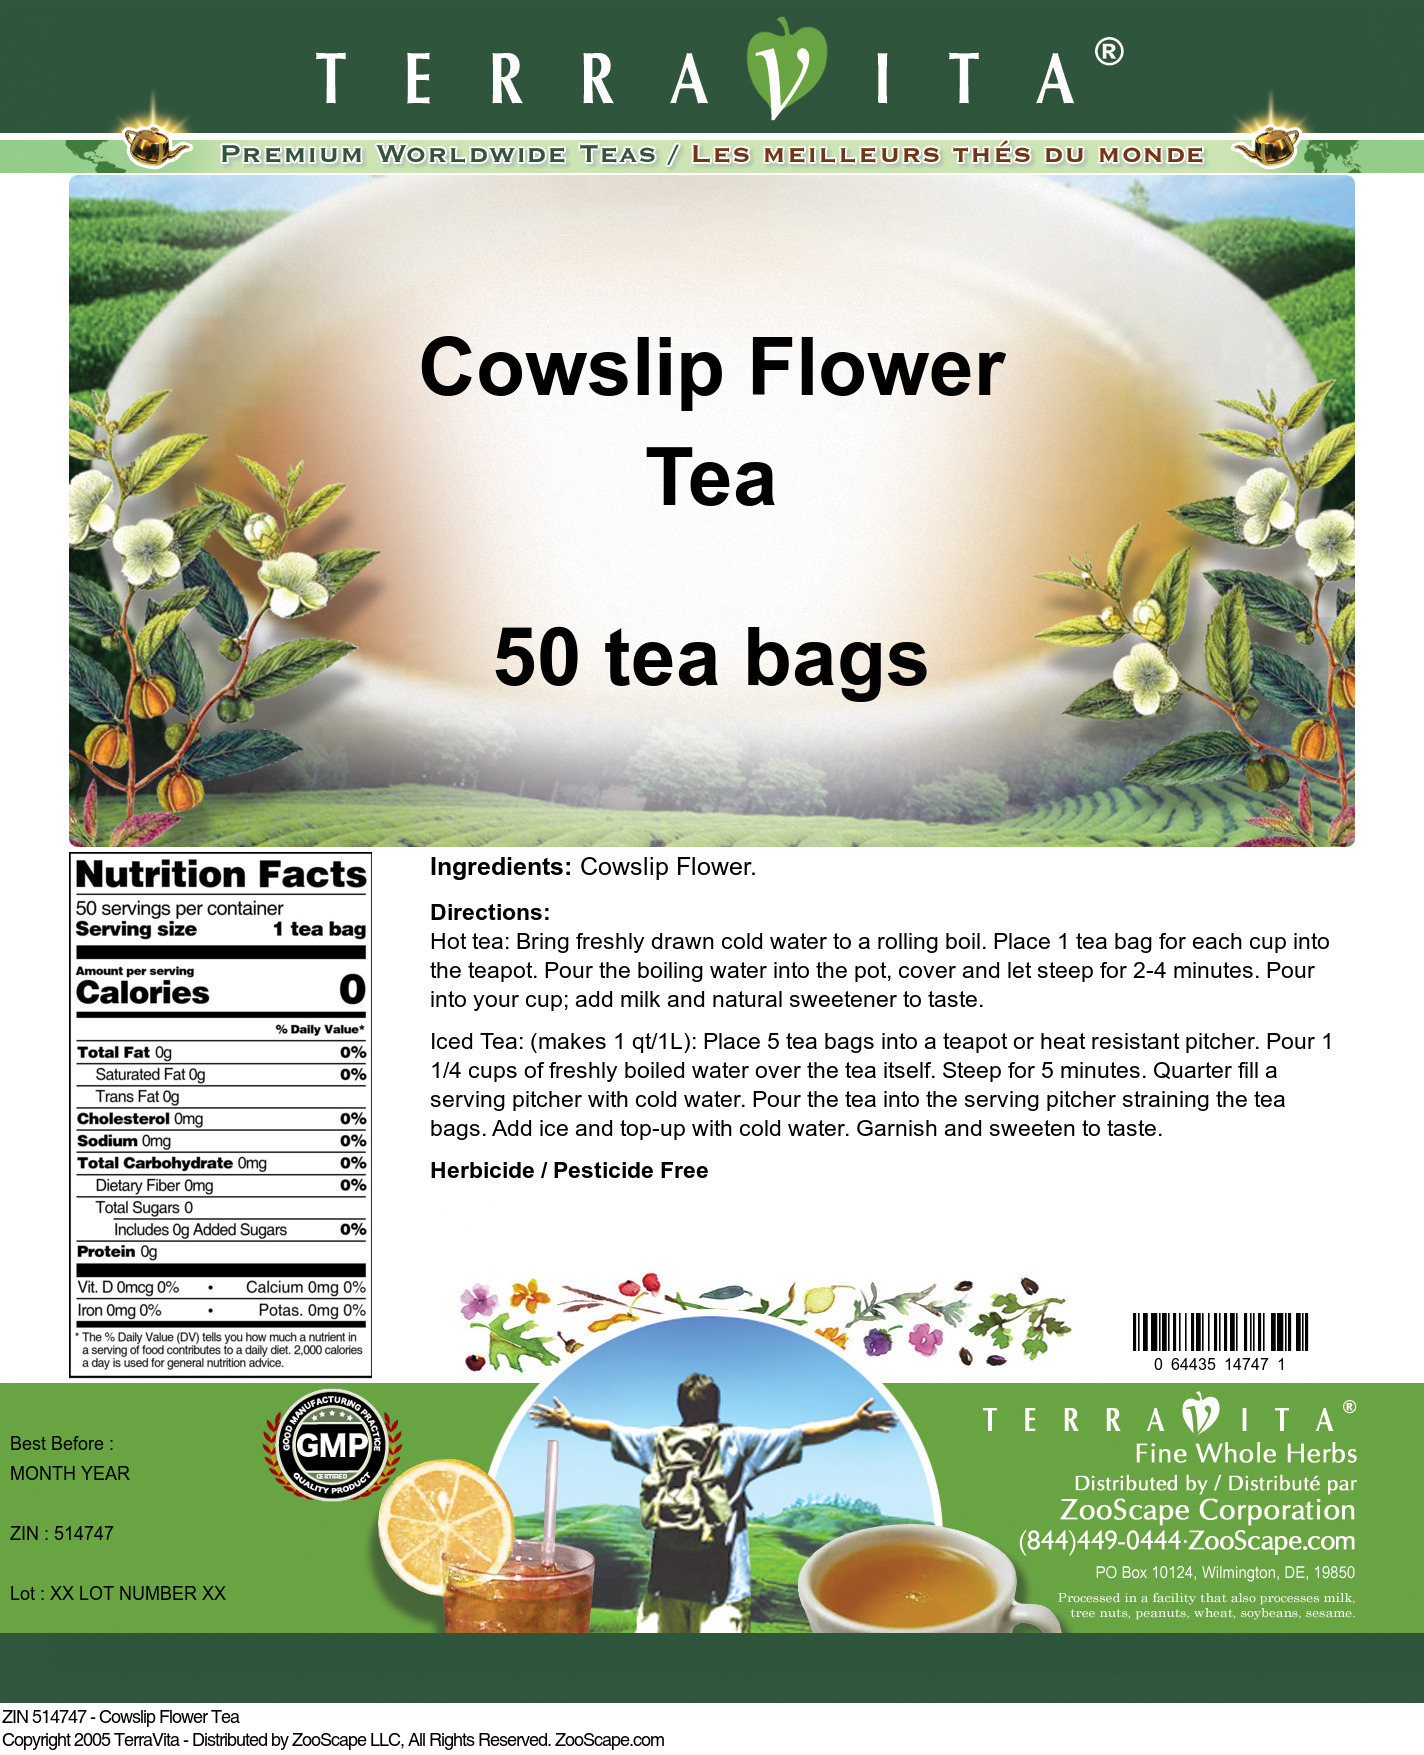 Cowslip Flower Tea